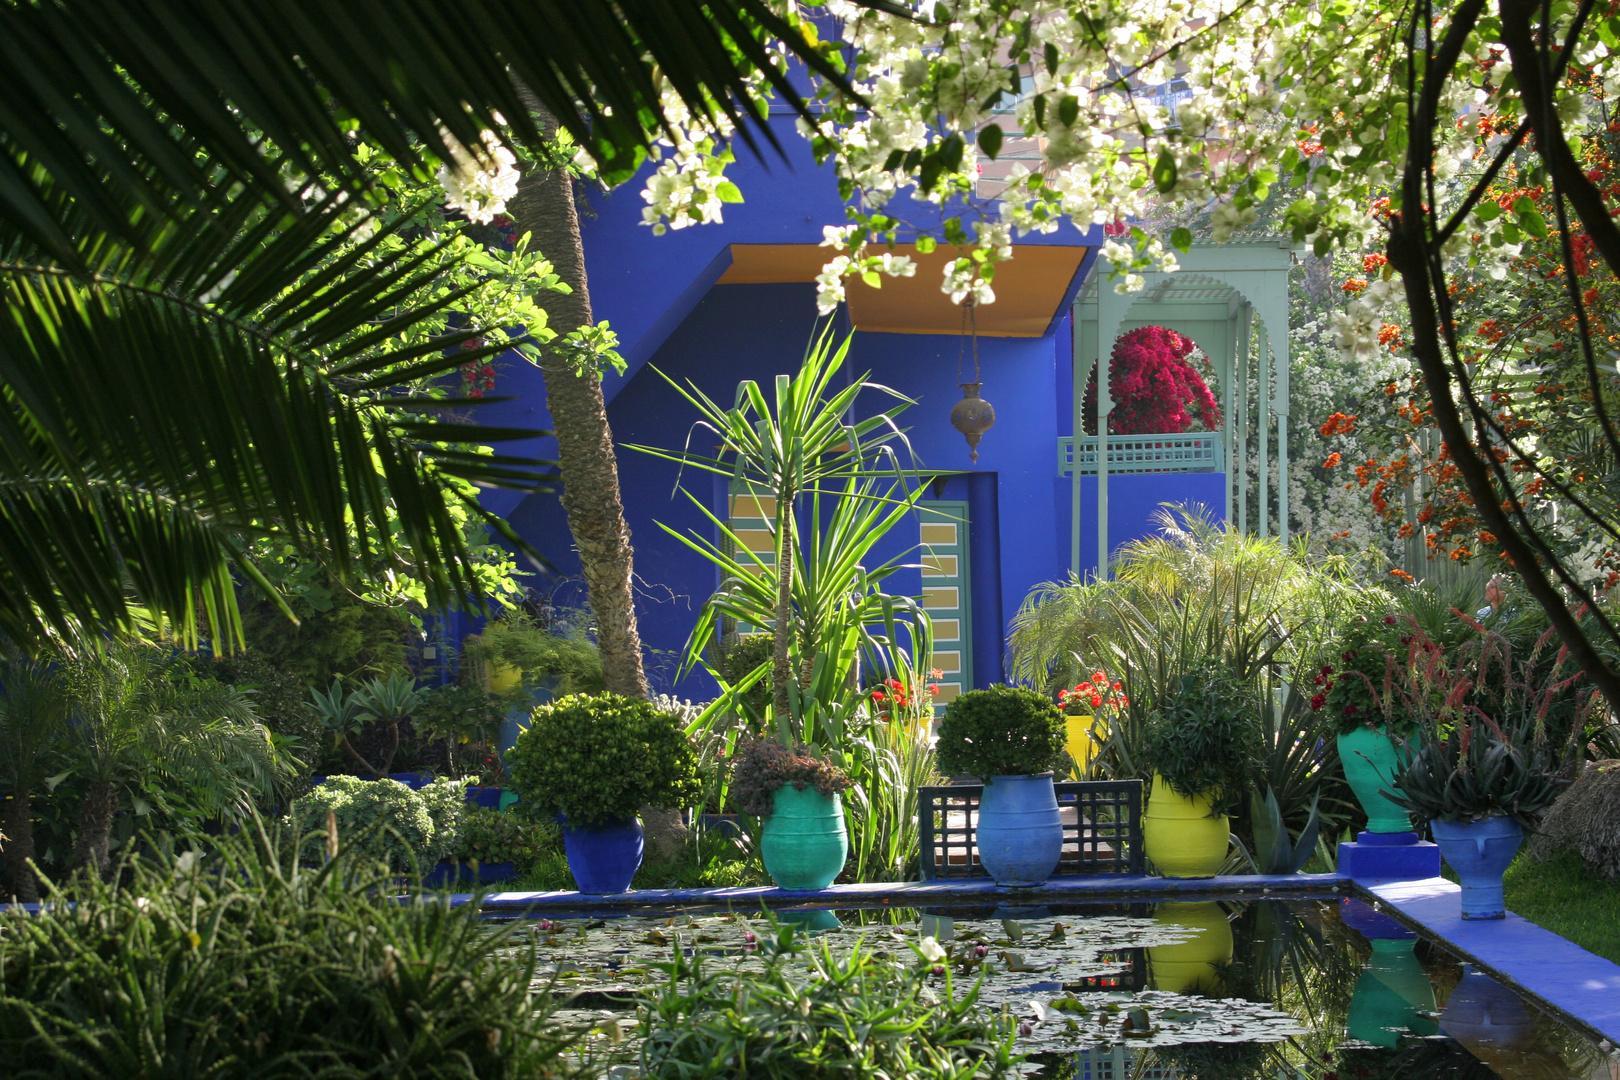 Jardin majorelle von yves saint laurent in marrakech 5 foto bild architektur profanbauten - Yves saint laurent jardin majorelle ...